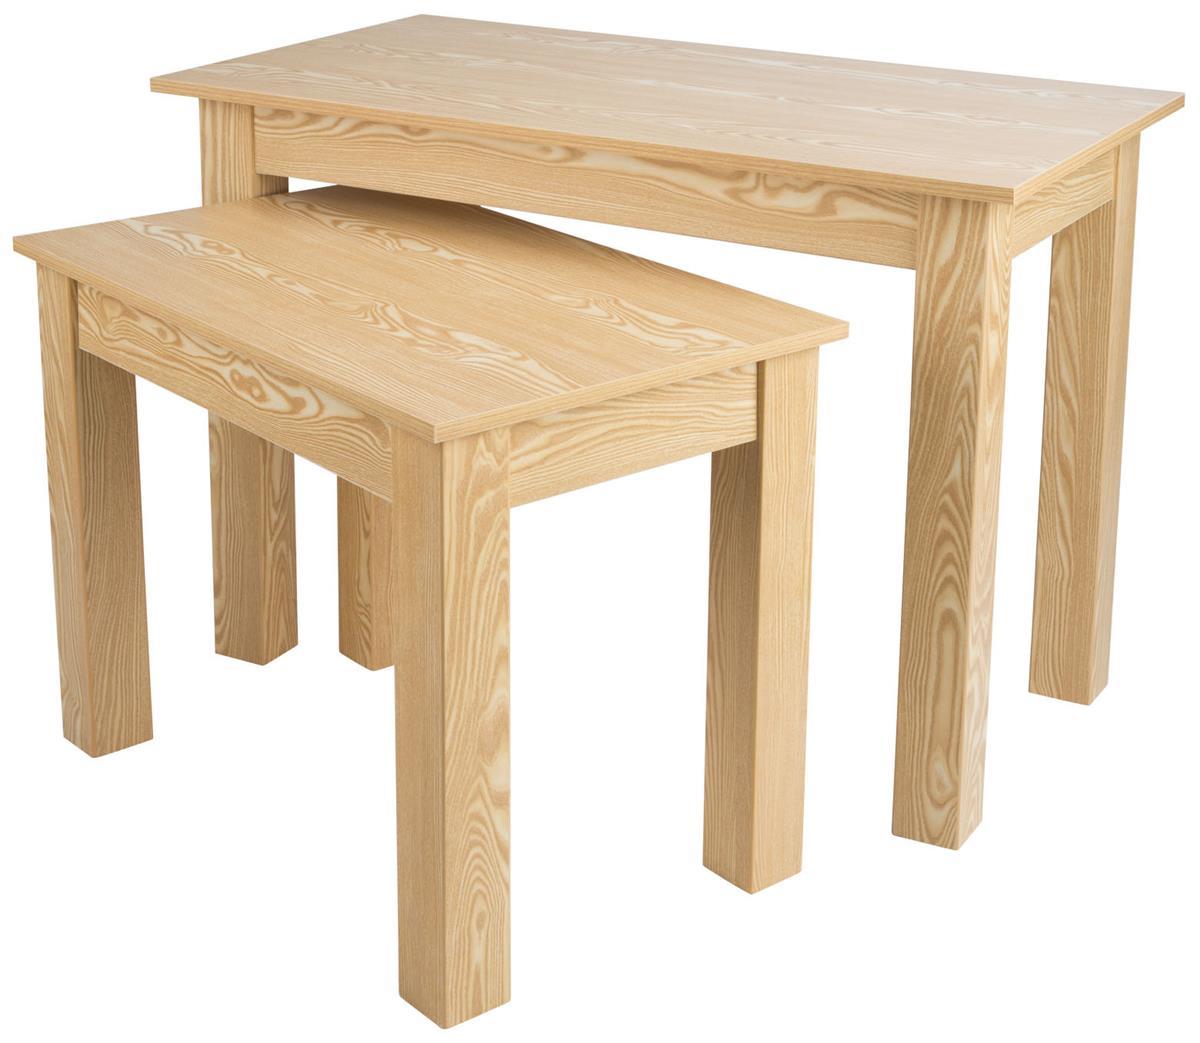 Wood Nesting Tables Set Of 2 Displays